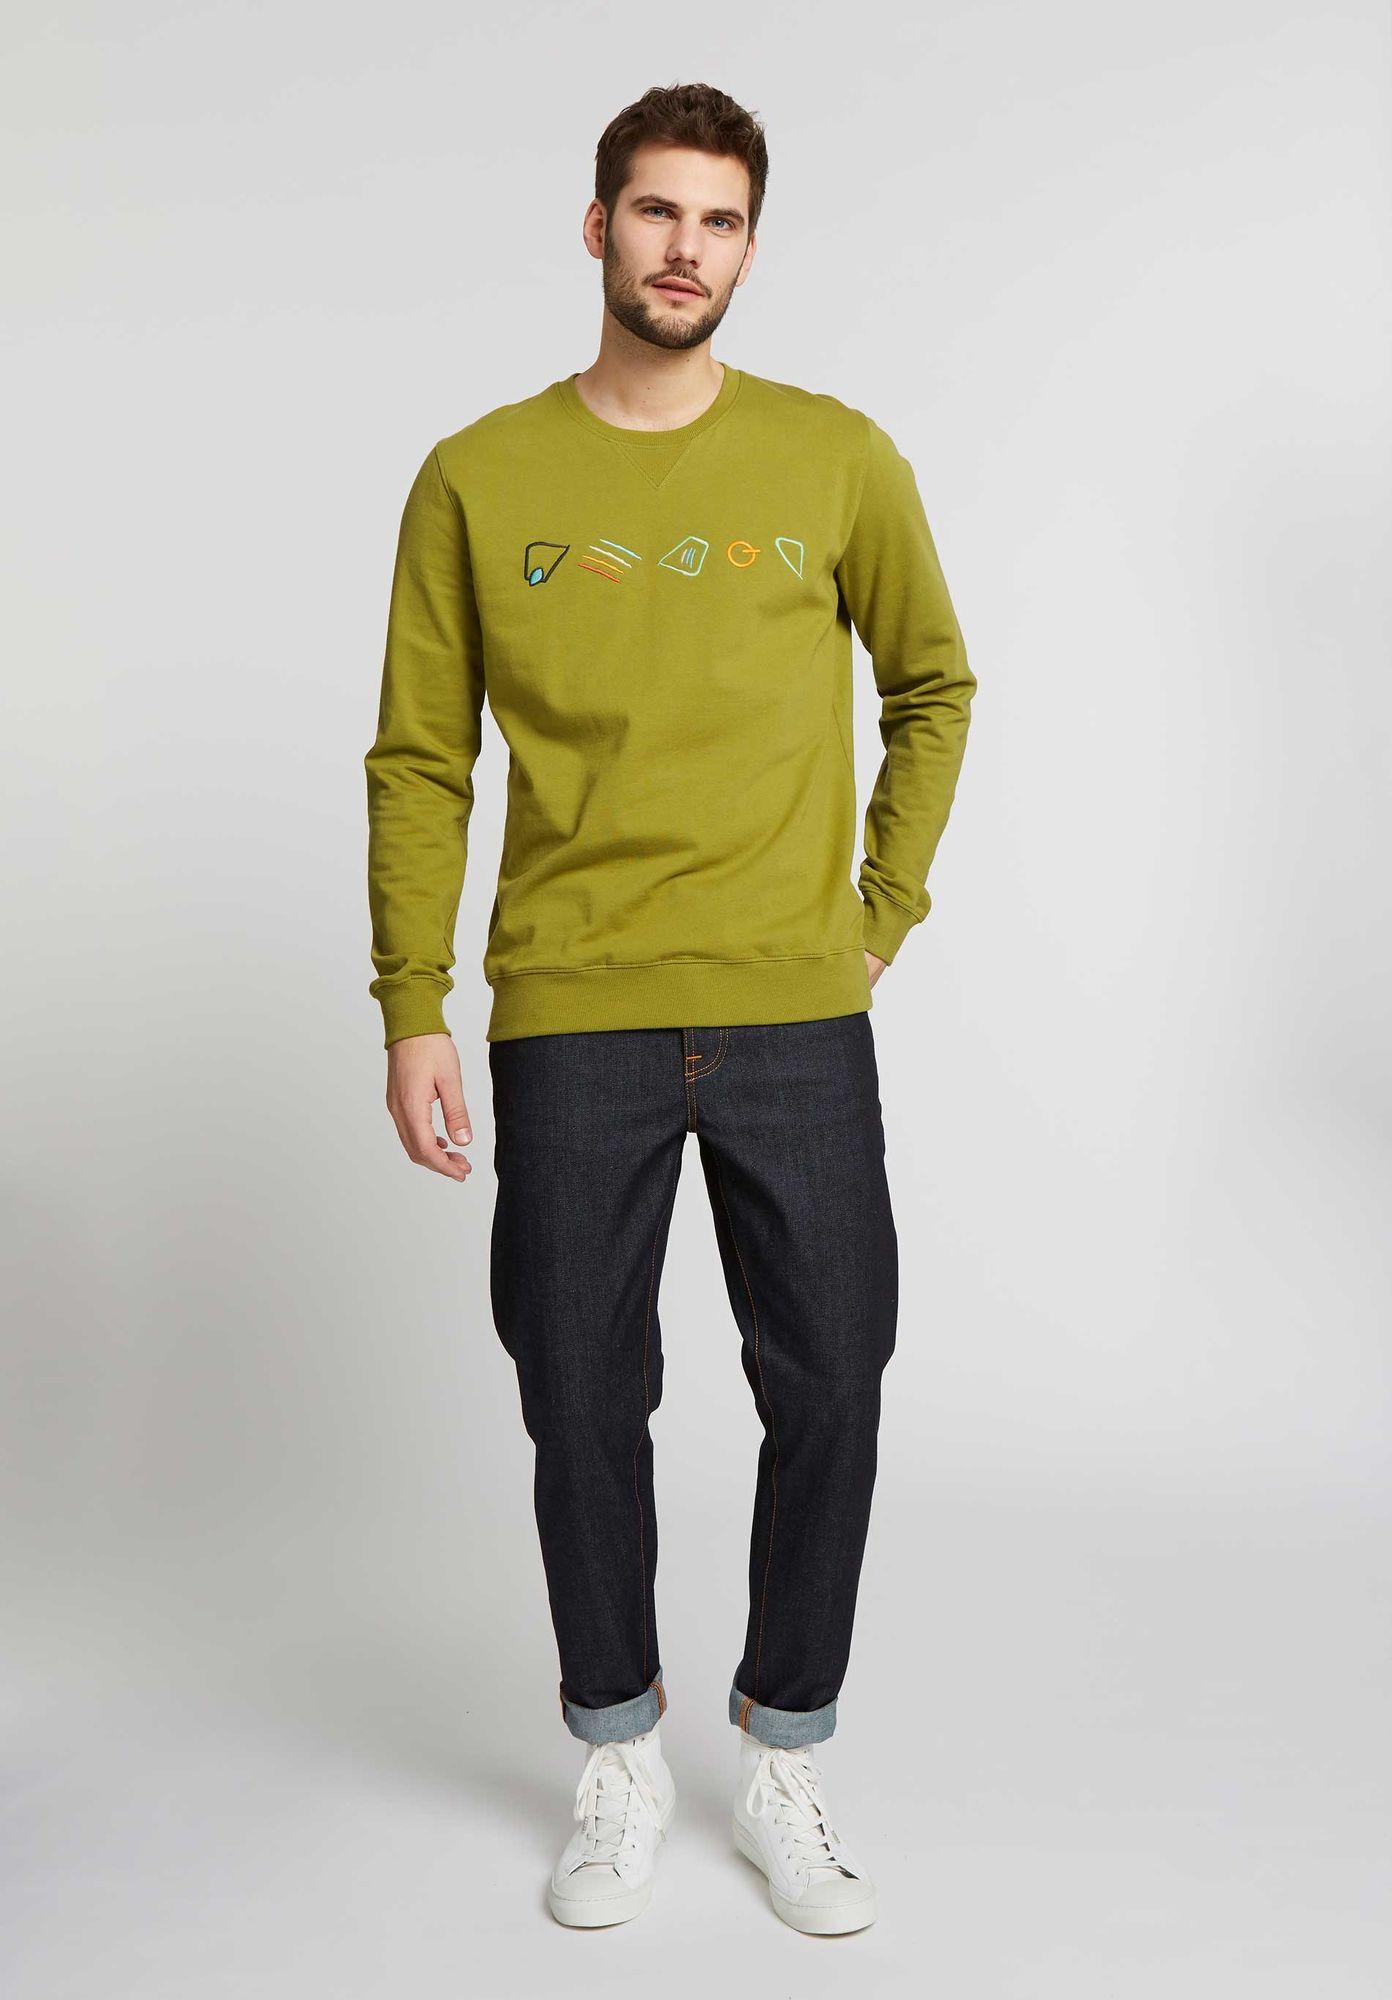 TT1029 Sweater